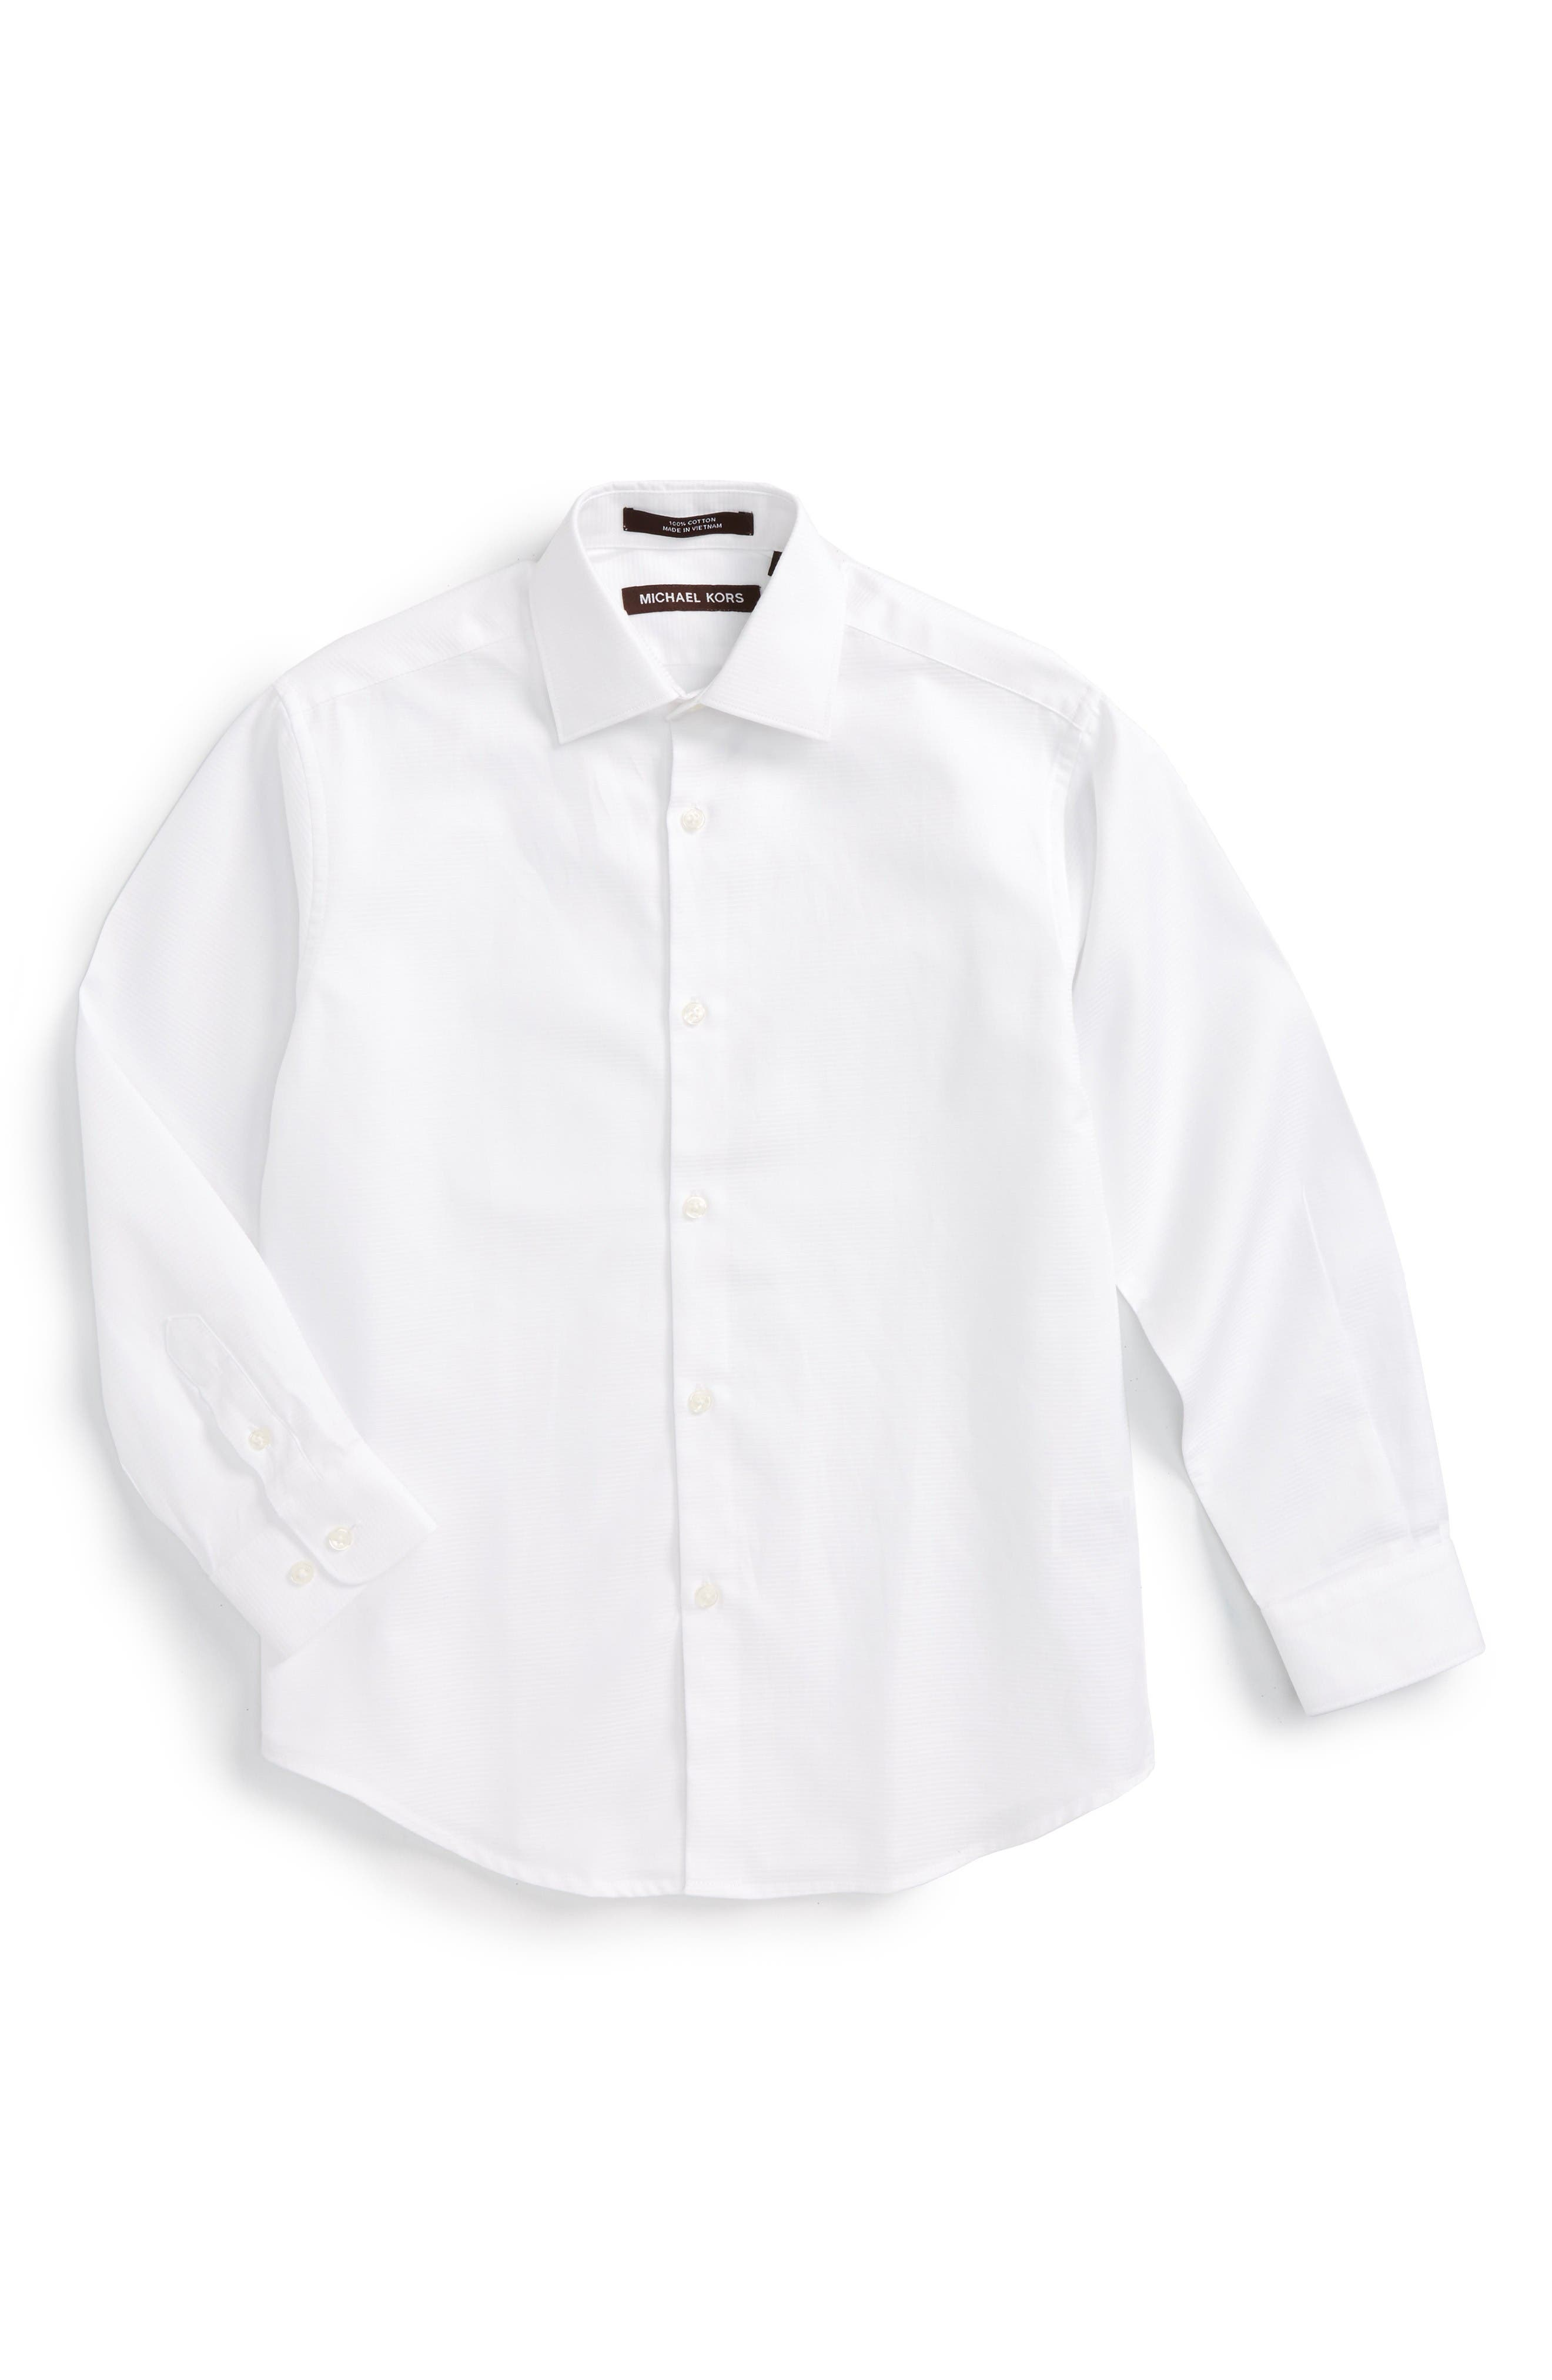 Main Image - Michael Kors Solid Dress Shirt (Big Boys)